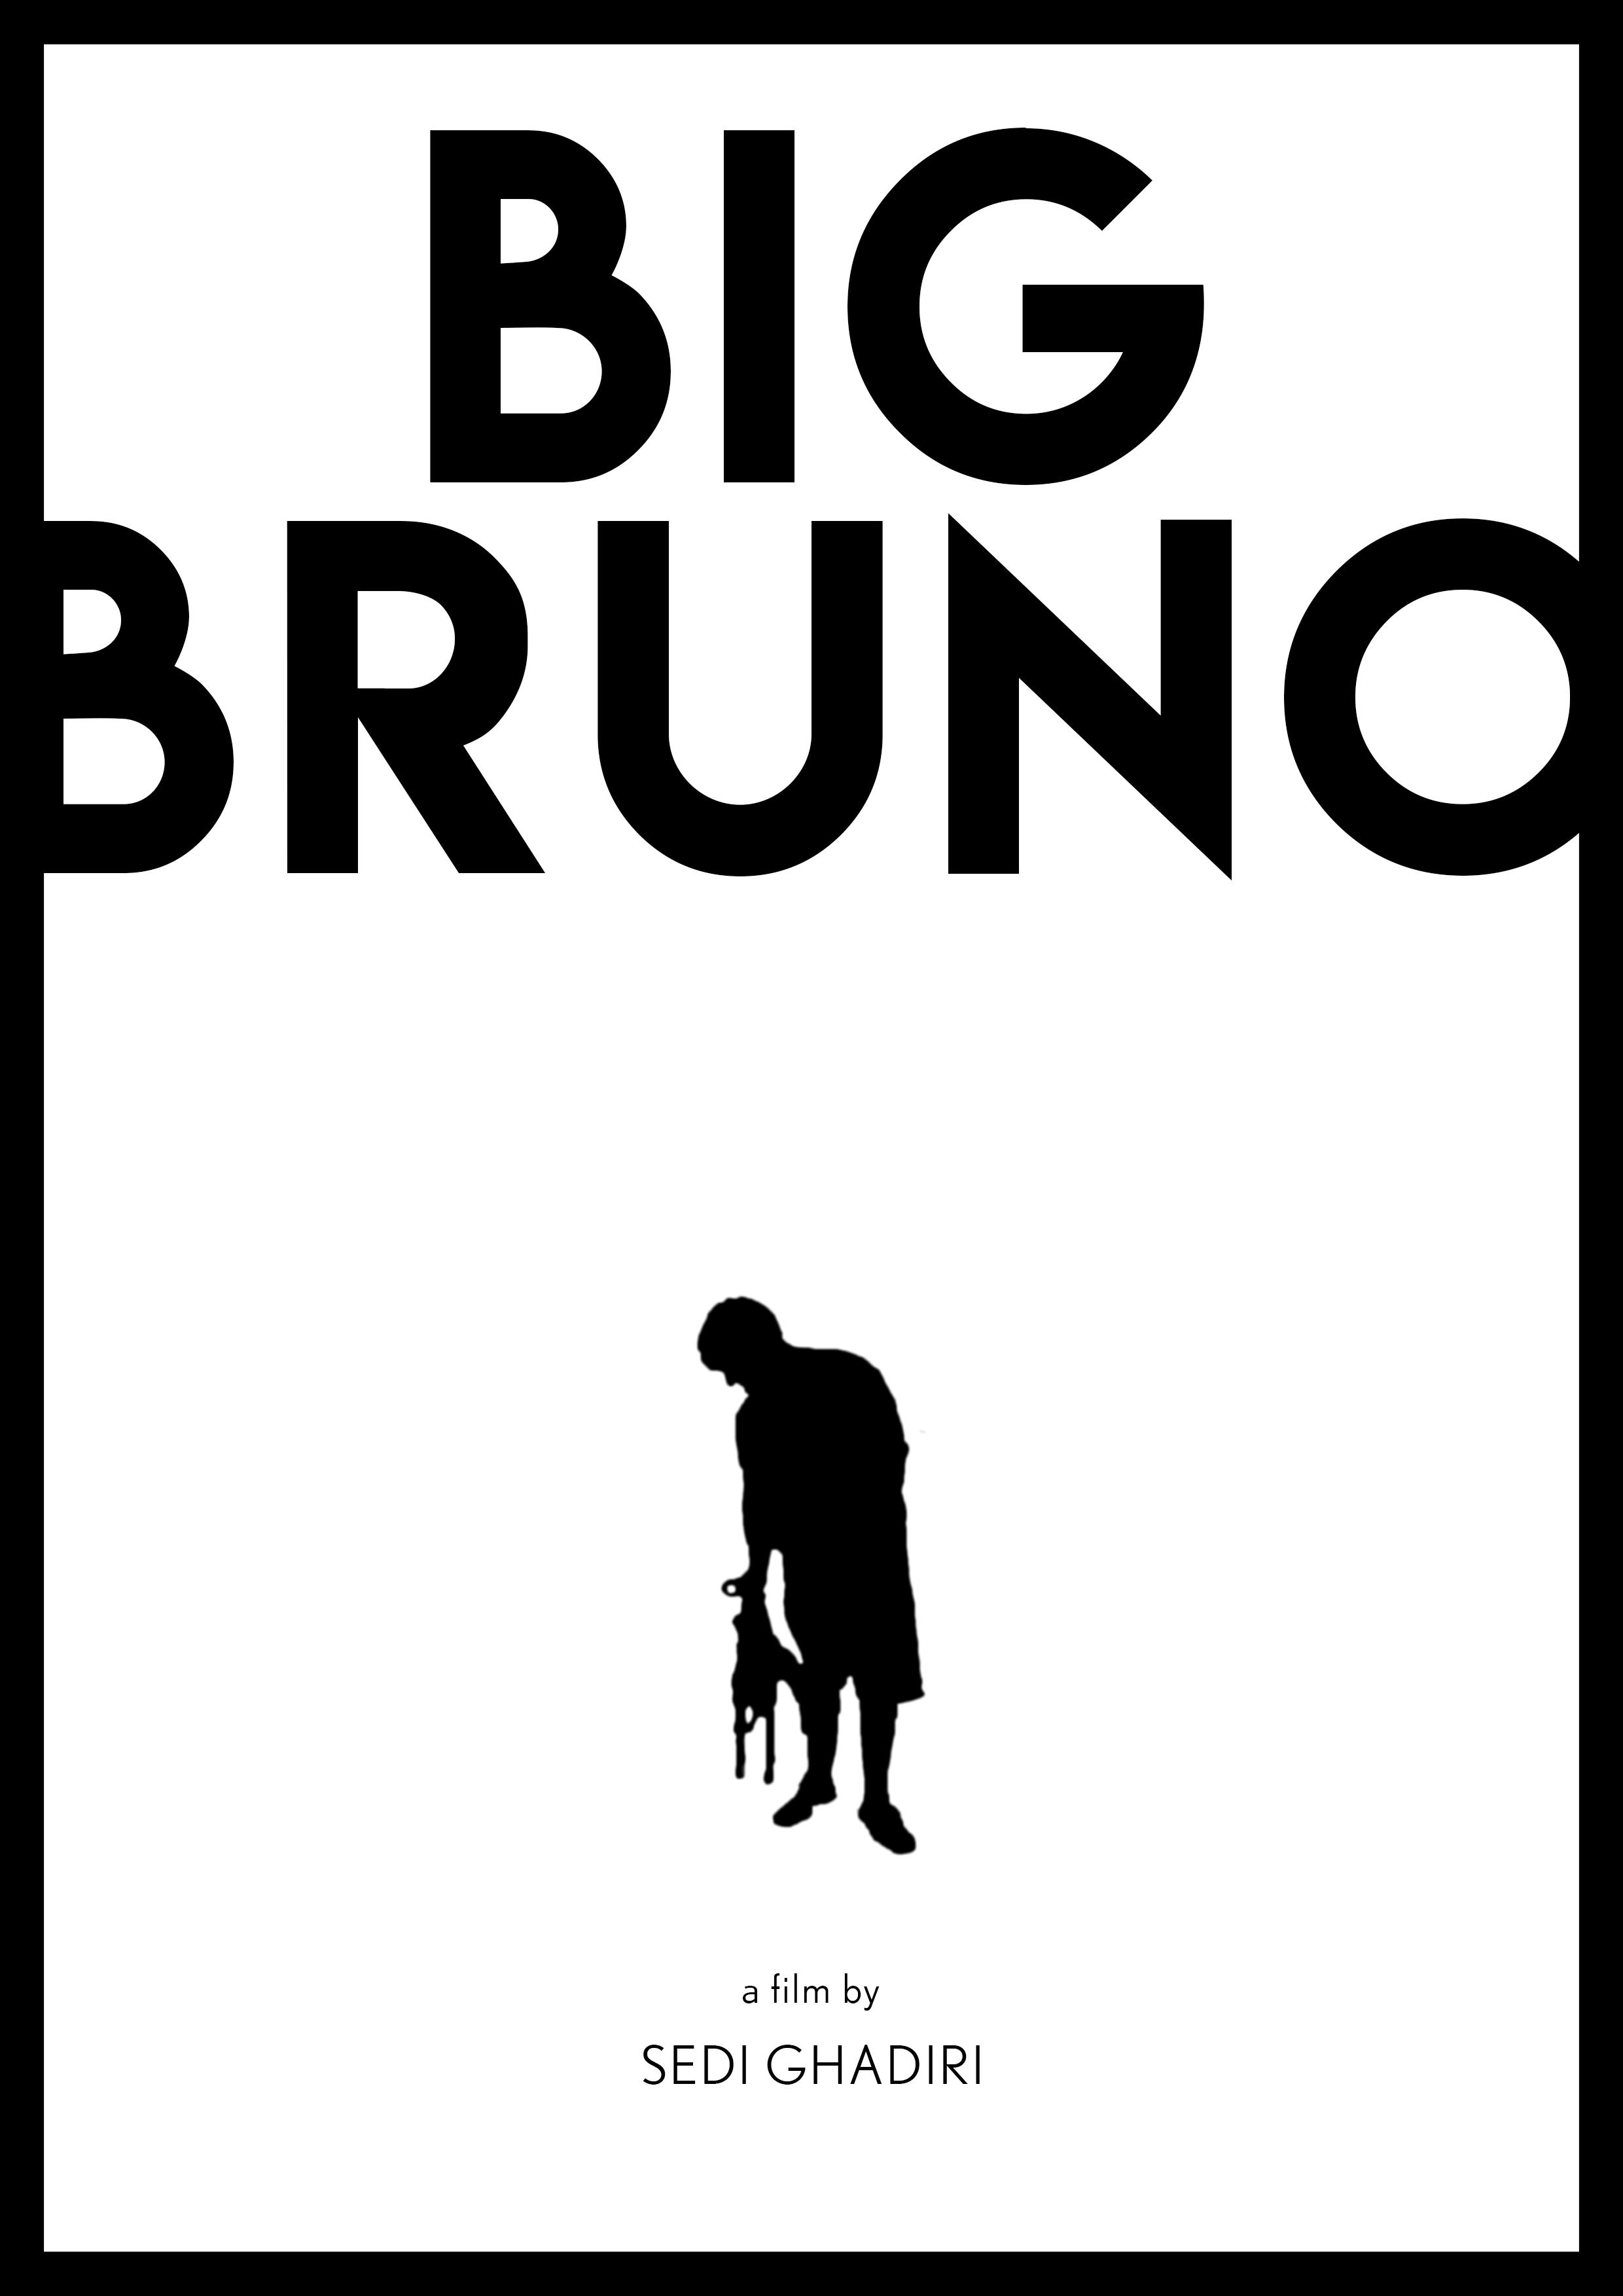 Big Bruno